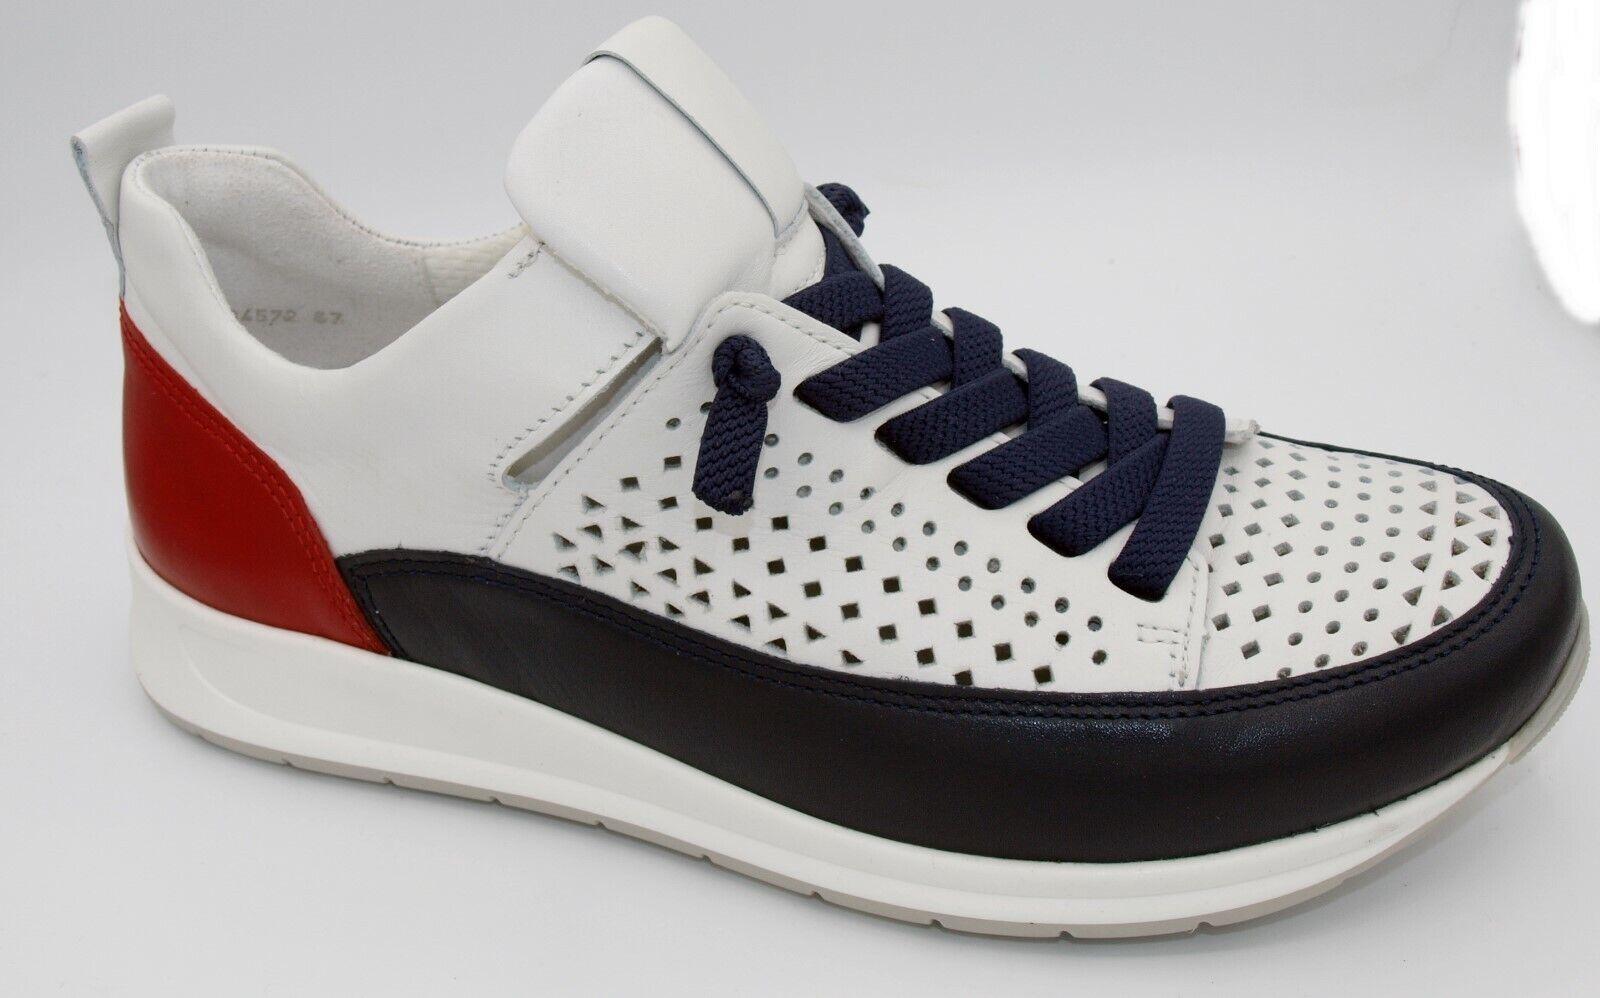 Sonderangebot ara Schuhe Slipper Damen blau weiß rot Weite H Neu 450/4